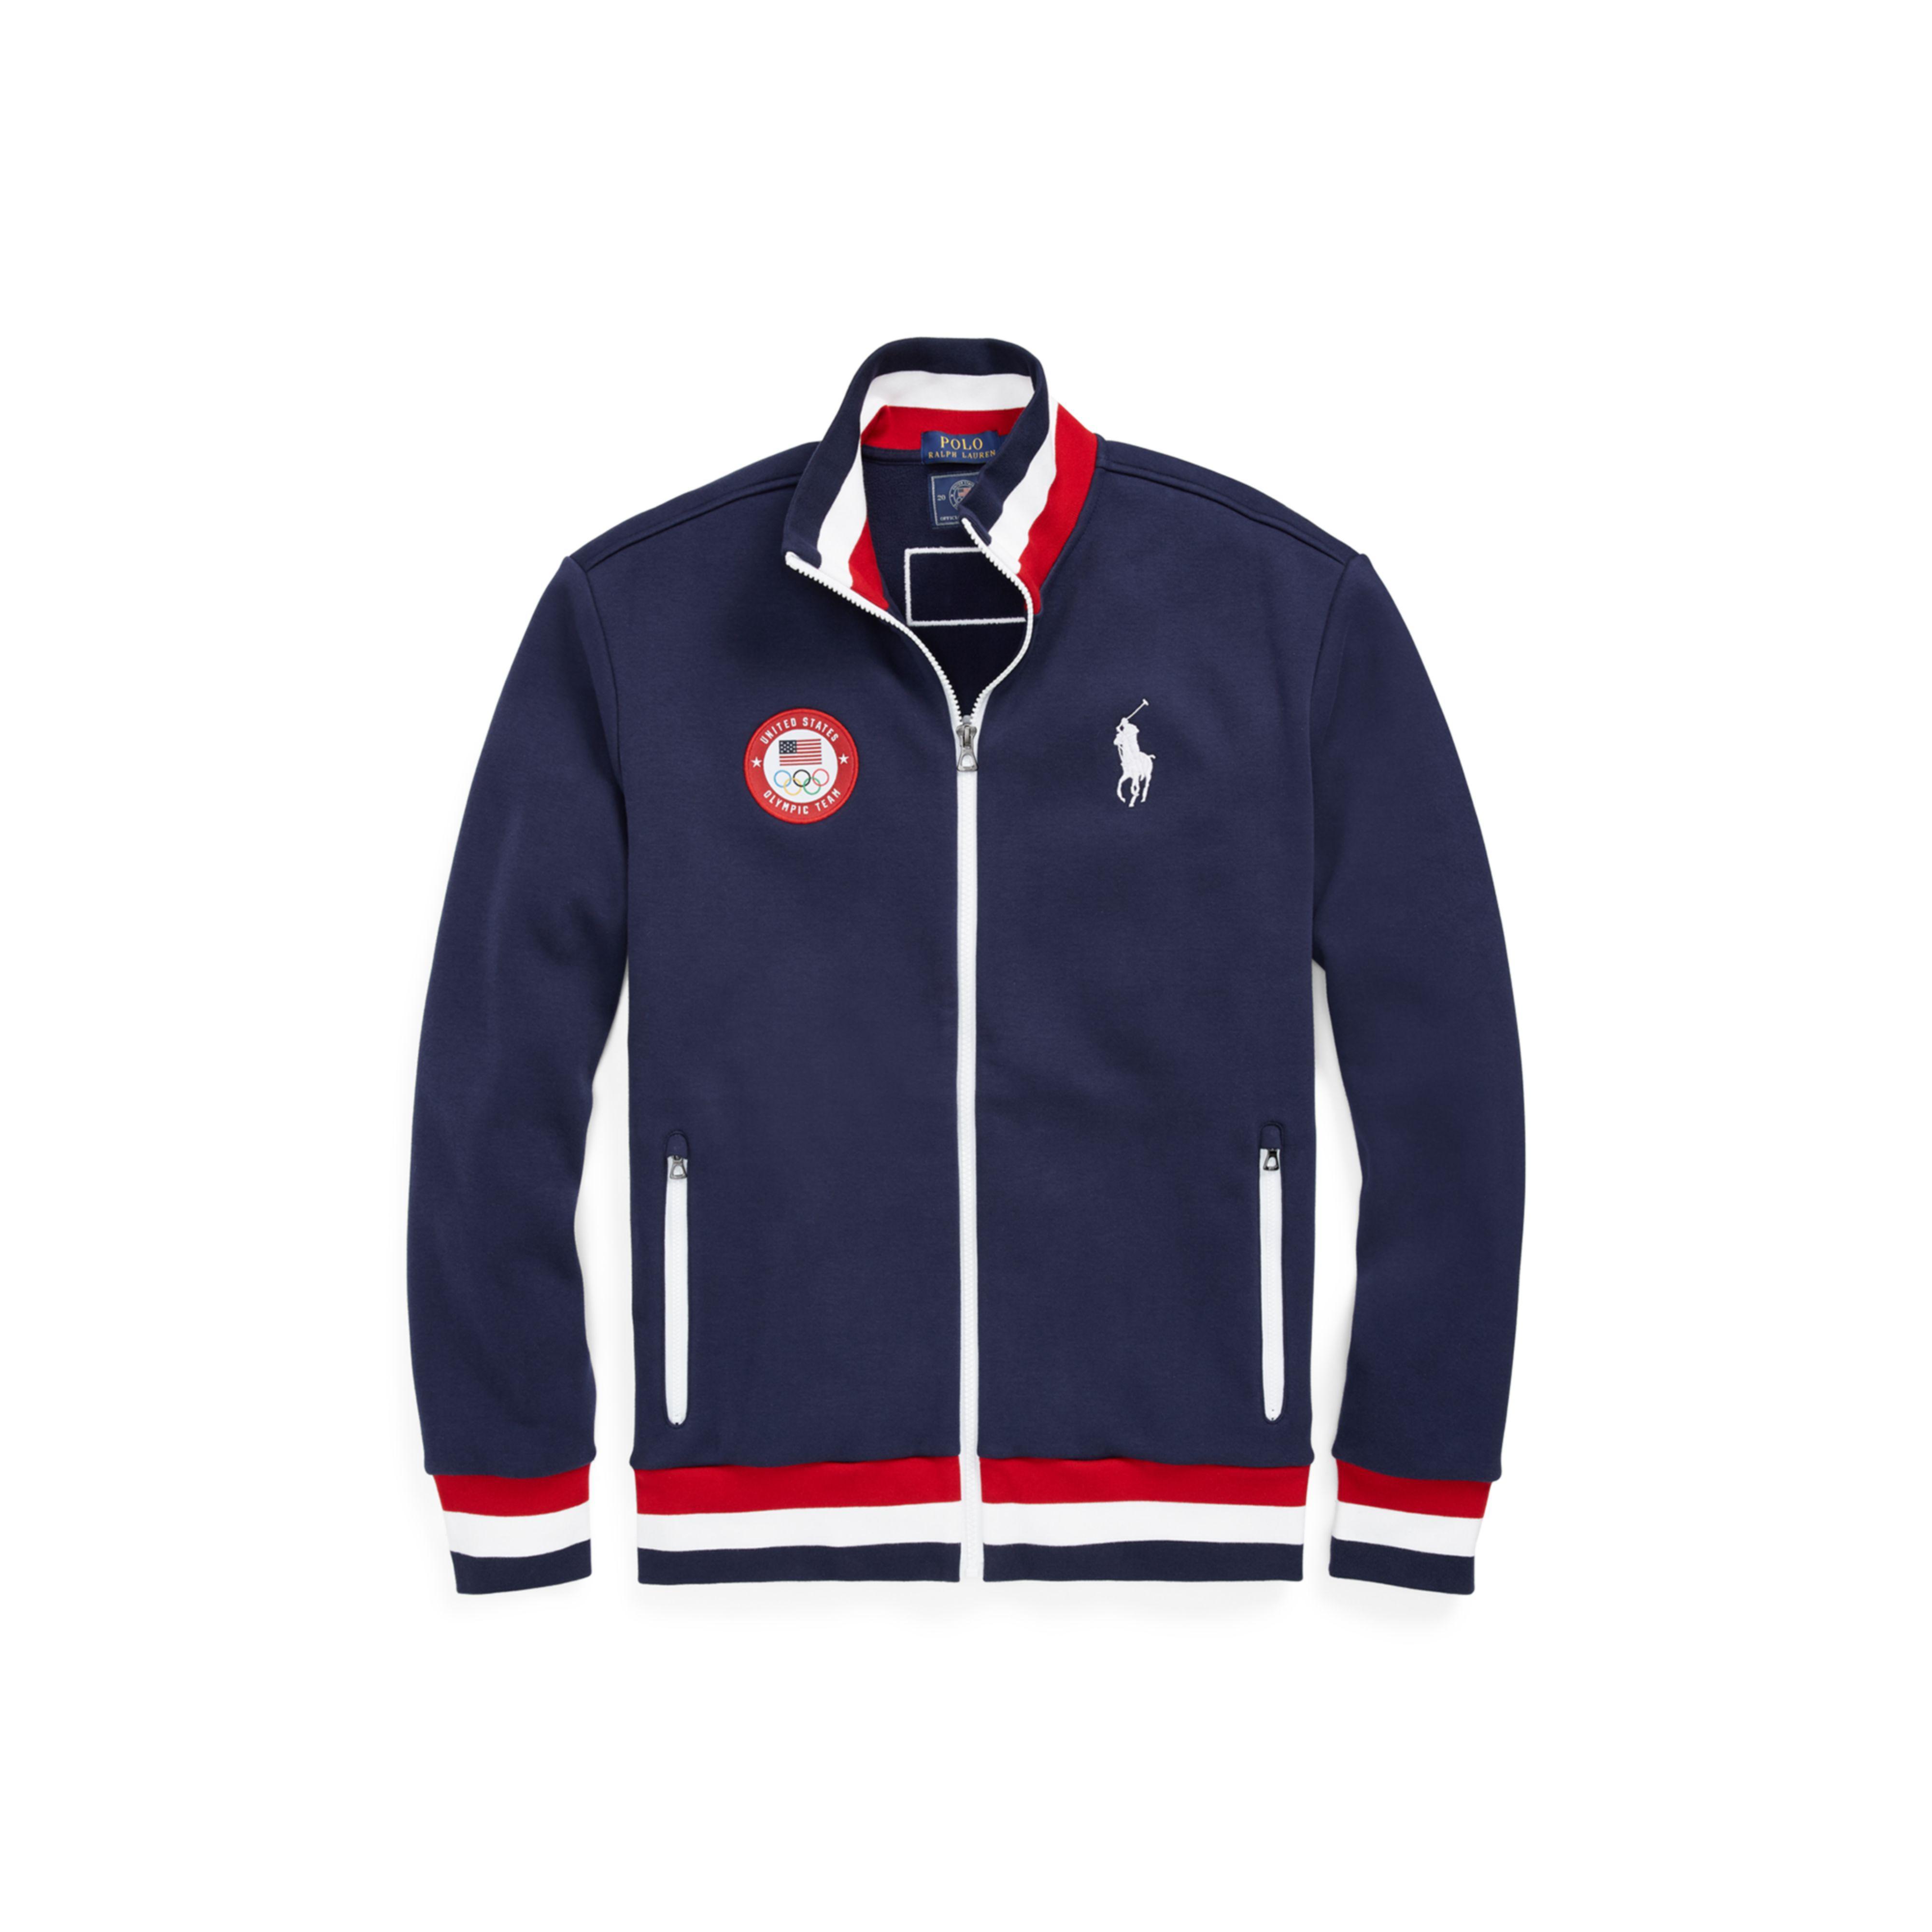 82ee36f939 Lyst - Polo Ralph Lauren Team Usa Fleece Track Jacket in Blue for Men